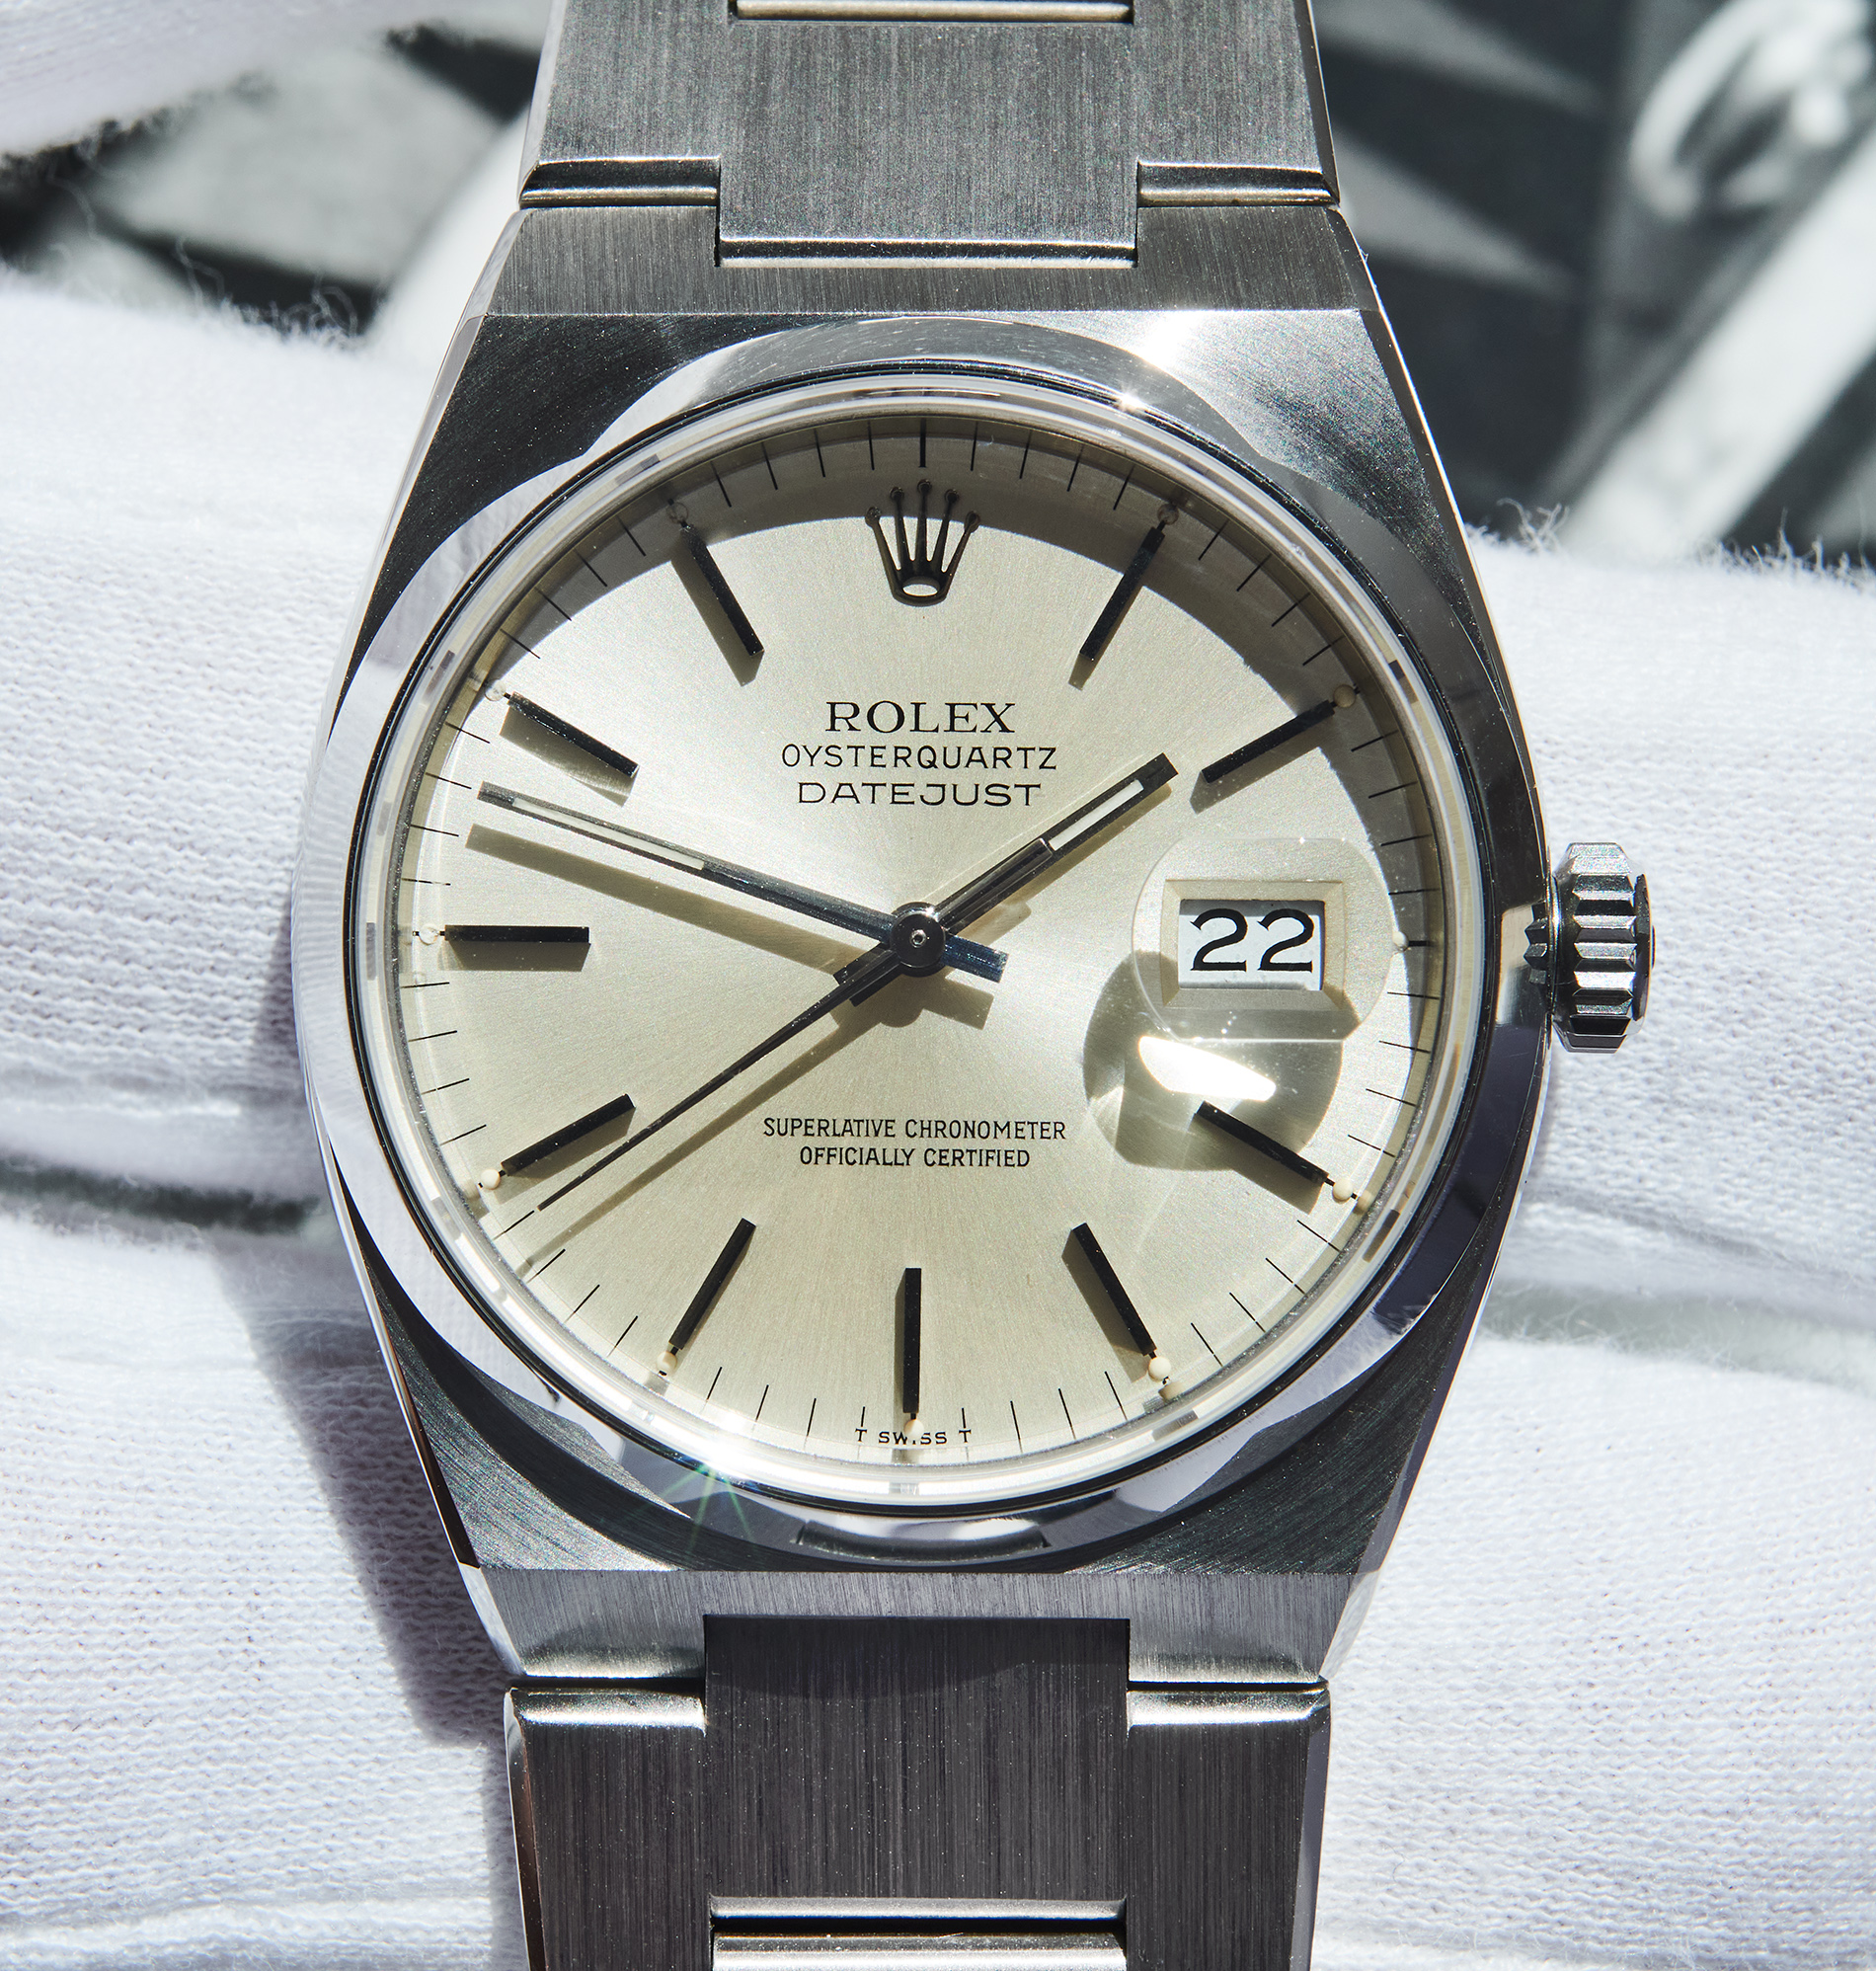 Rolex Oysterquartz NOS 1980